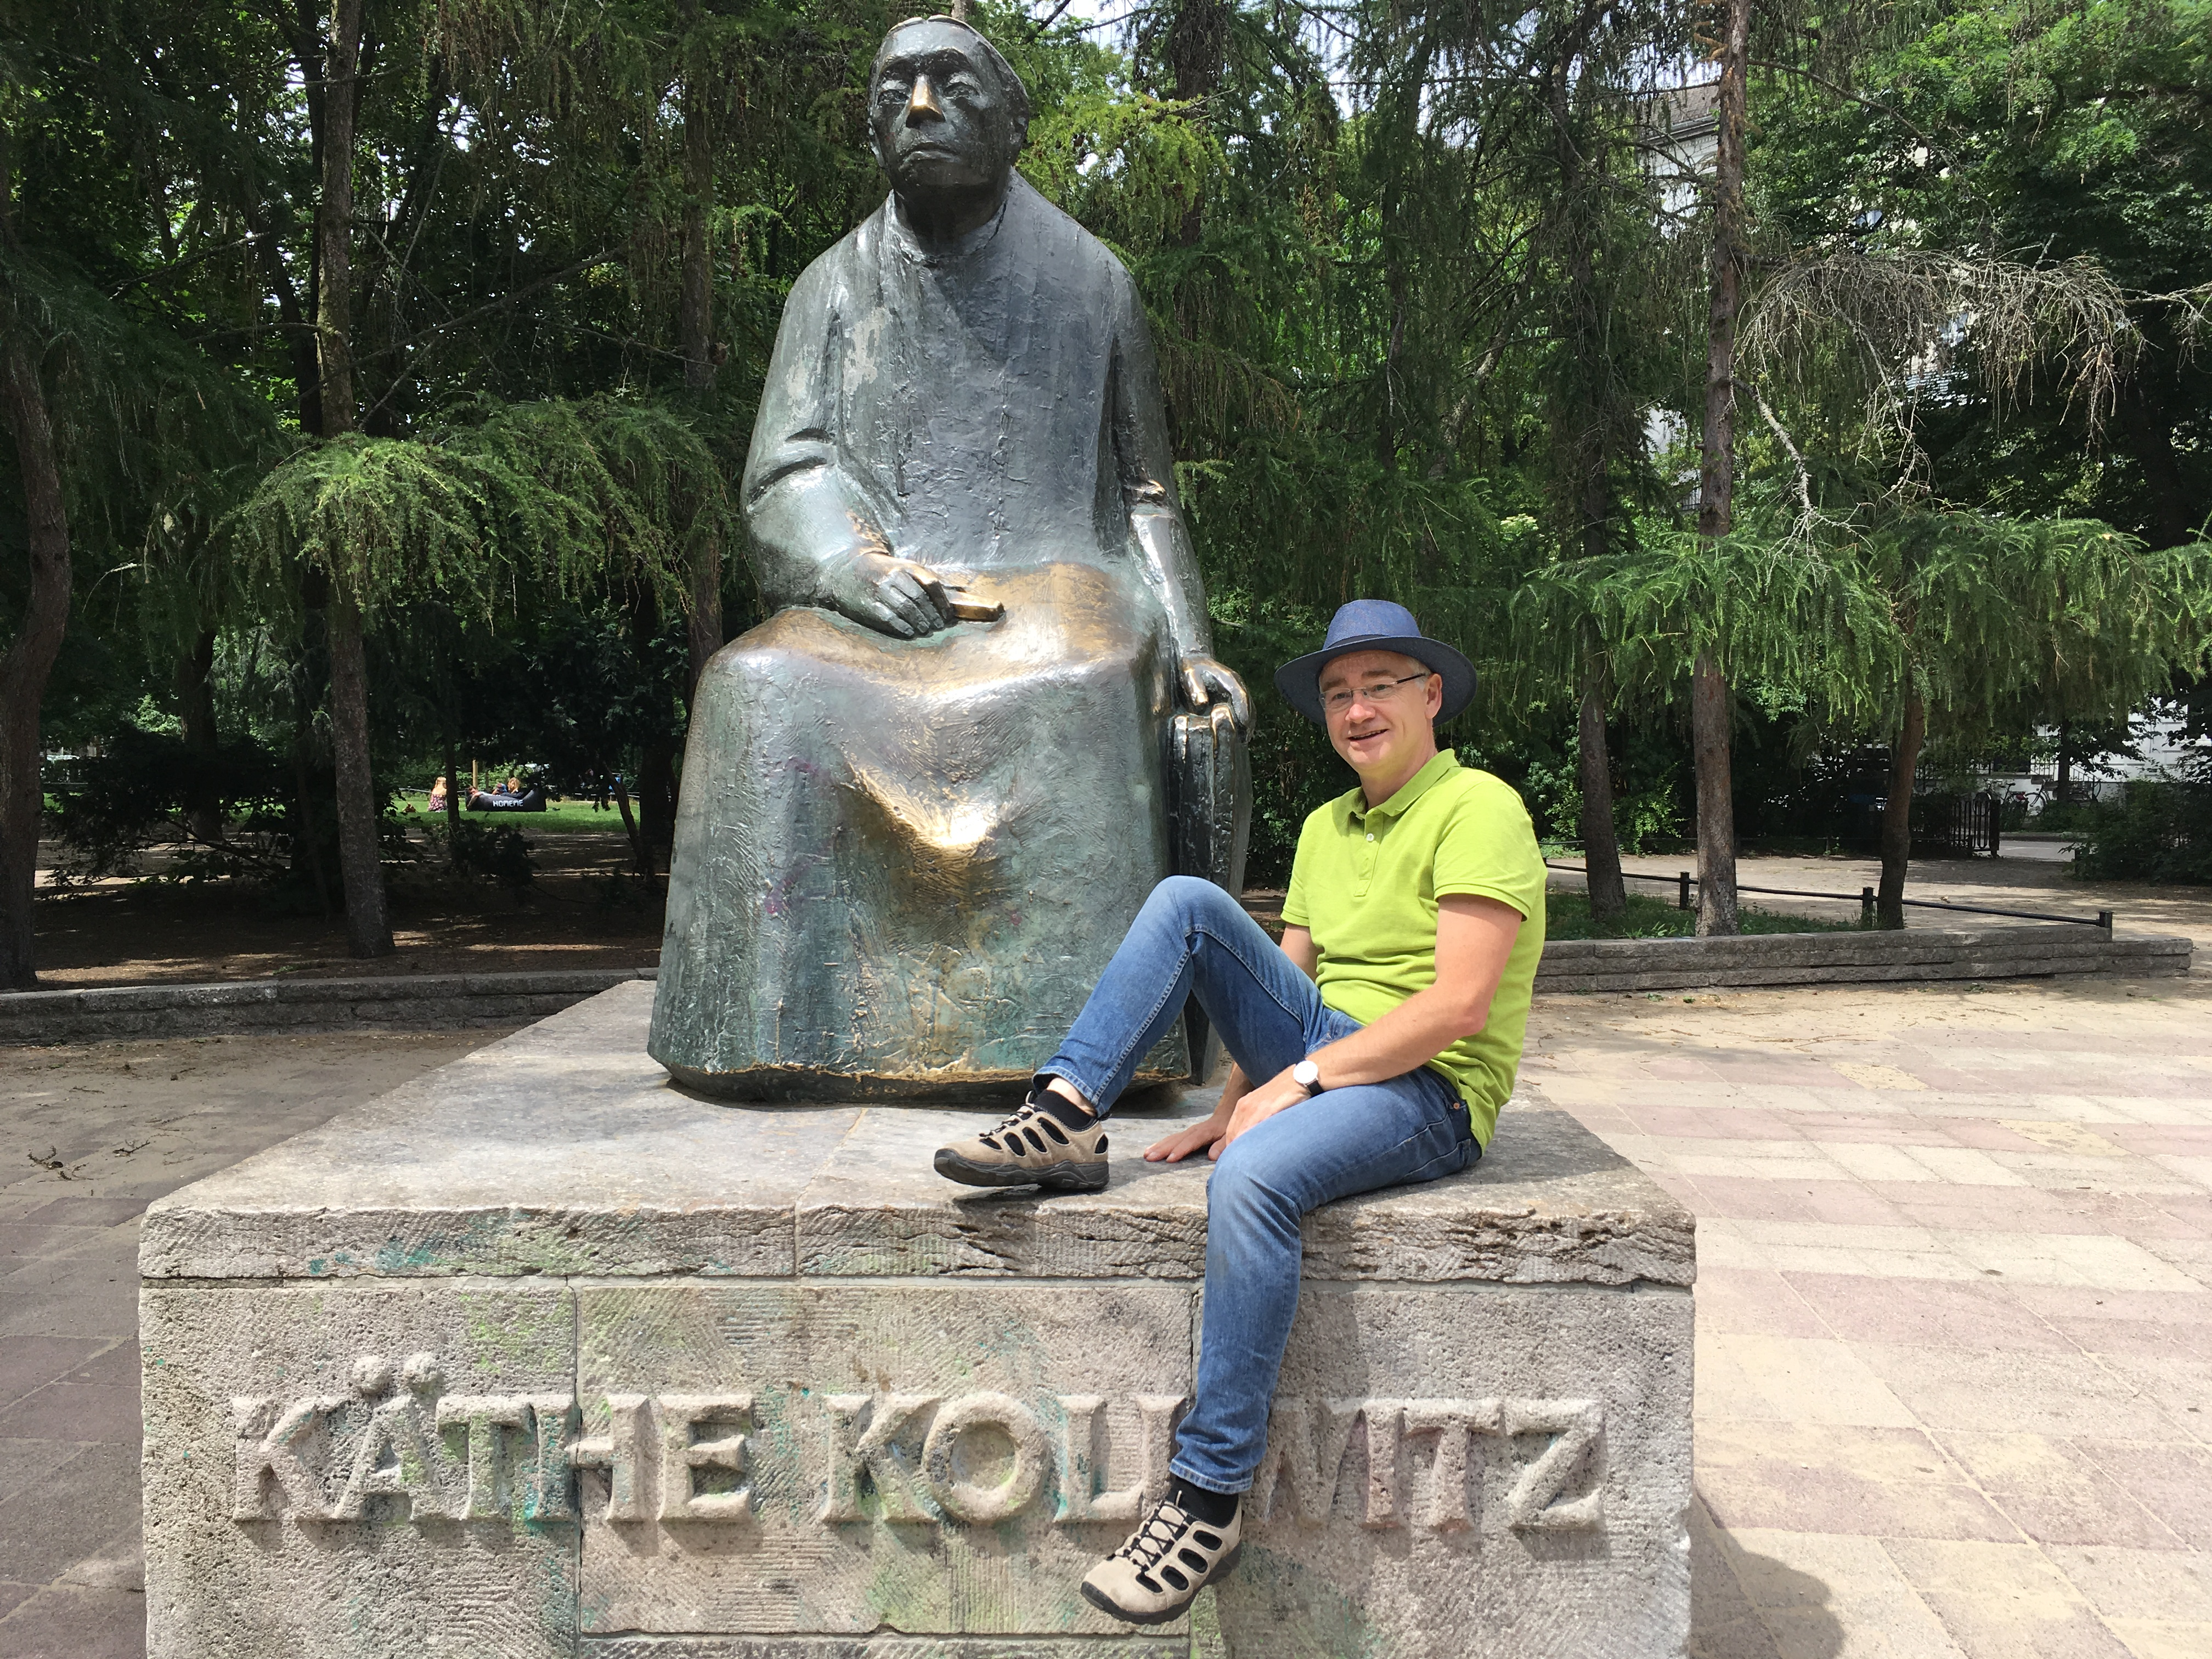 Michael Bienert führt auf Kollwitz' Spuren durch den Kiez (Constanze Nauhaus)